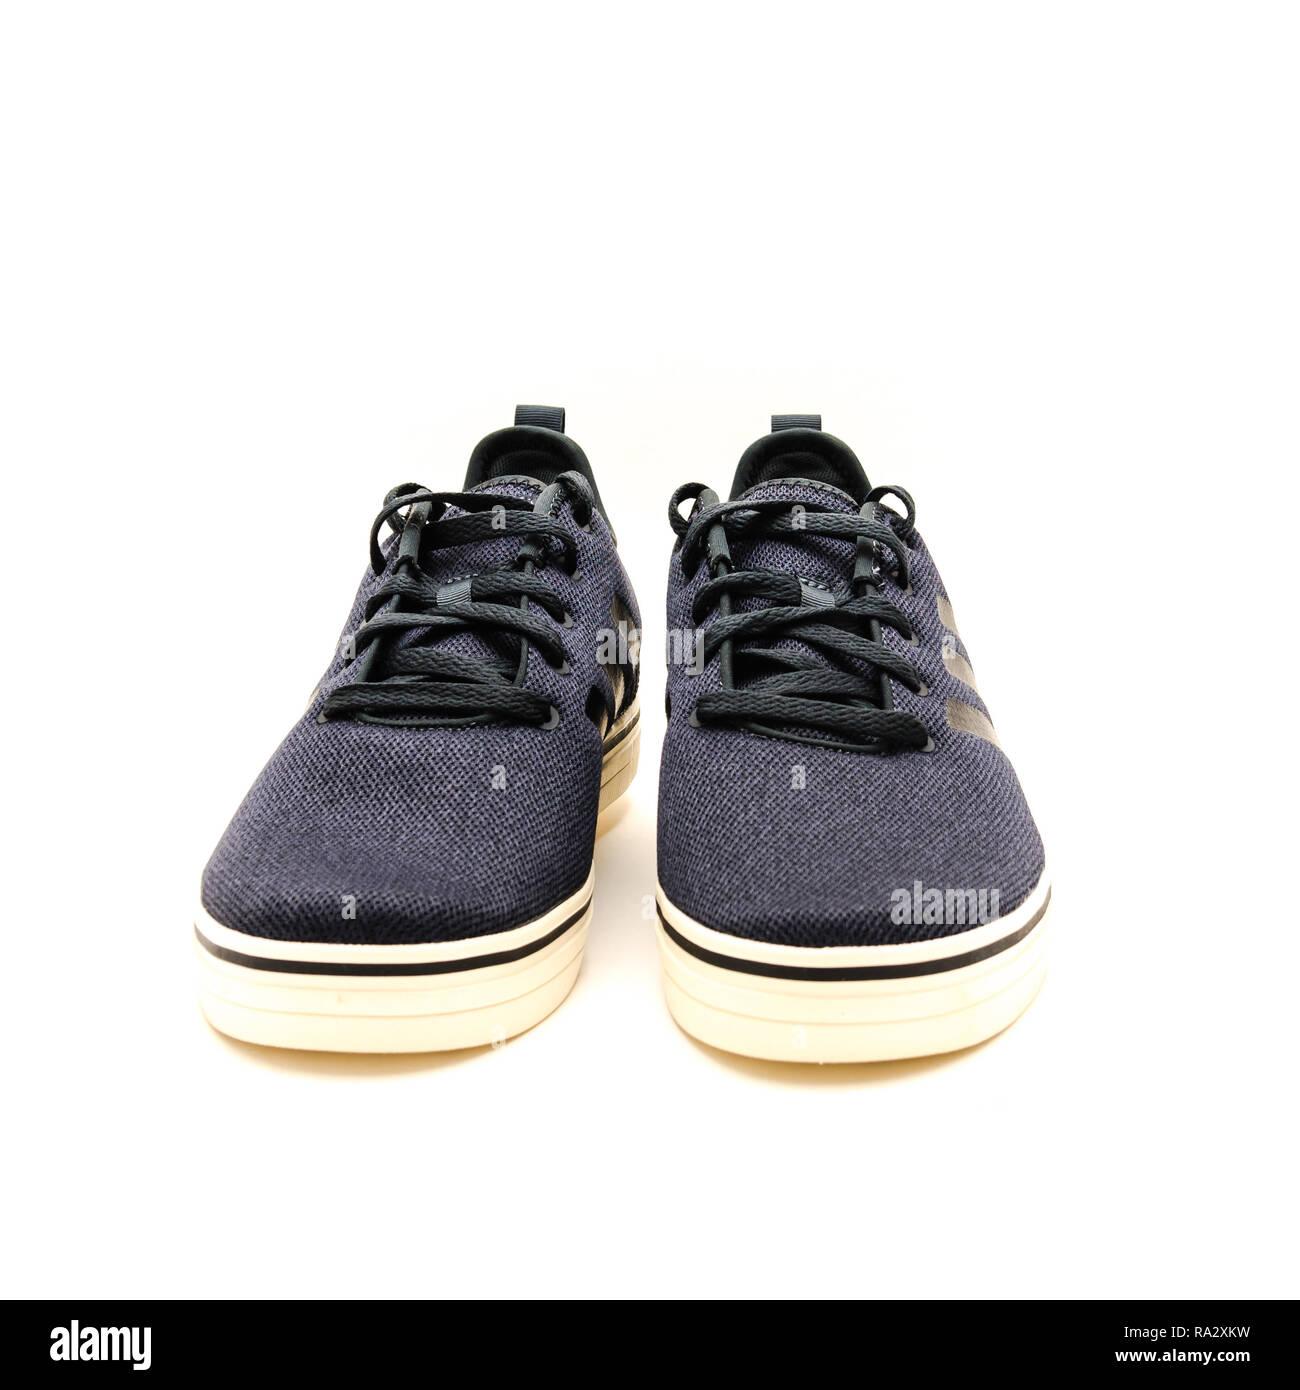 Brand new pair of dark gray men sneaker shoes isolated Stock Photo